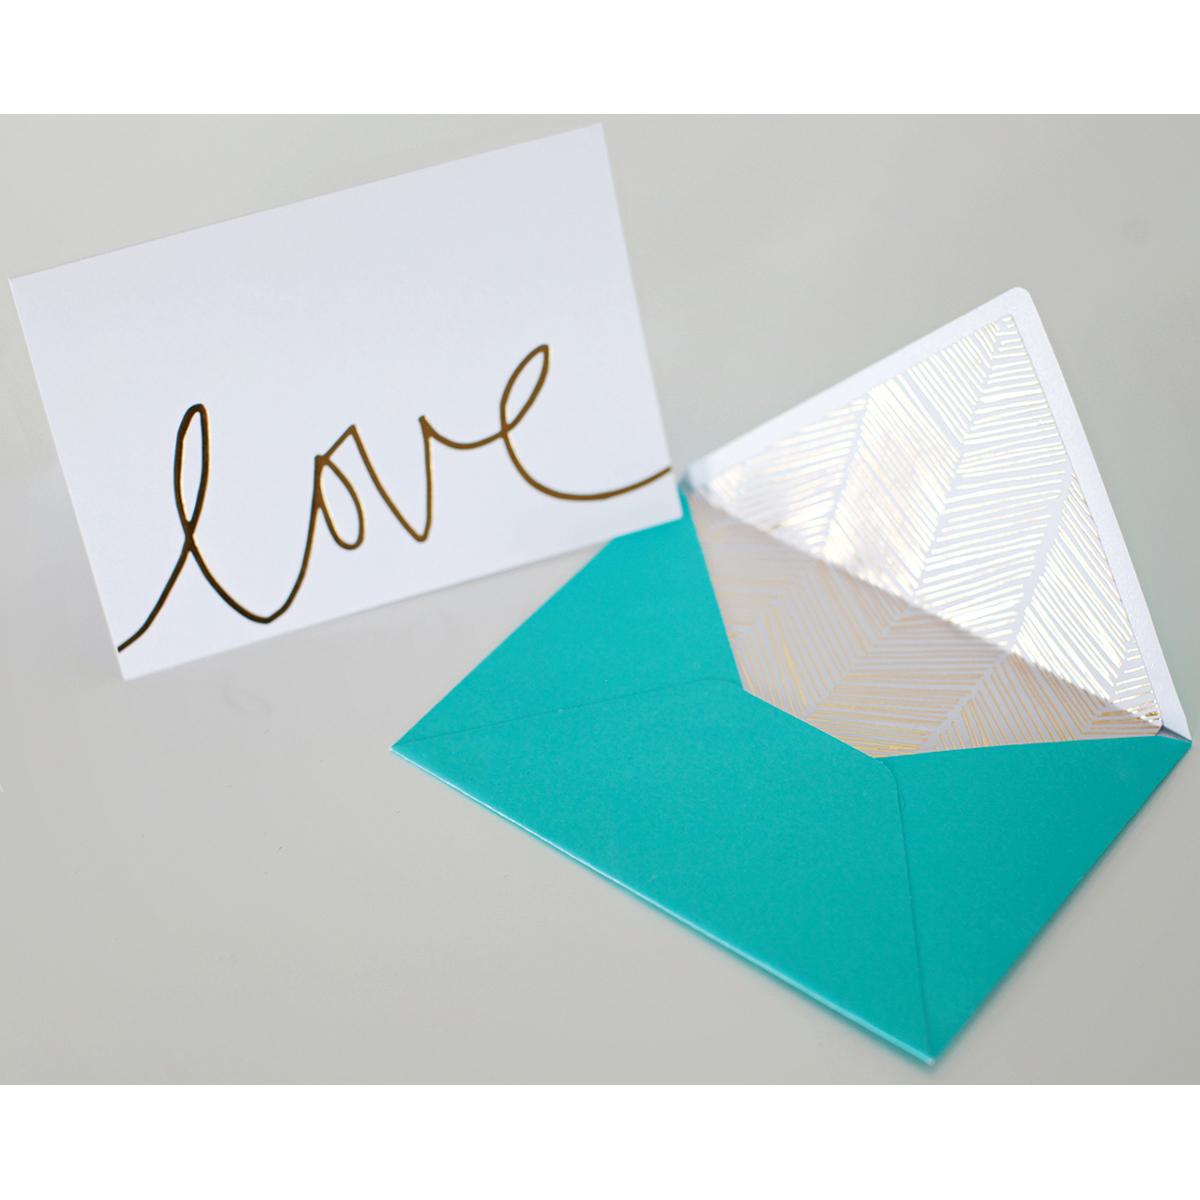 "Studio Gold Foiled Cards W/Envelopes 5.25""X3.75"" 12/Pkg-Love"